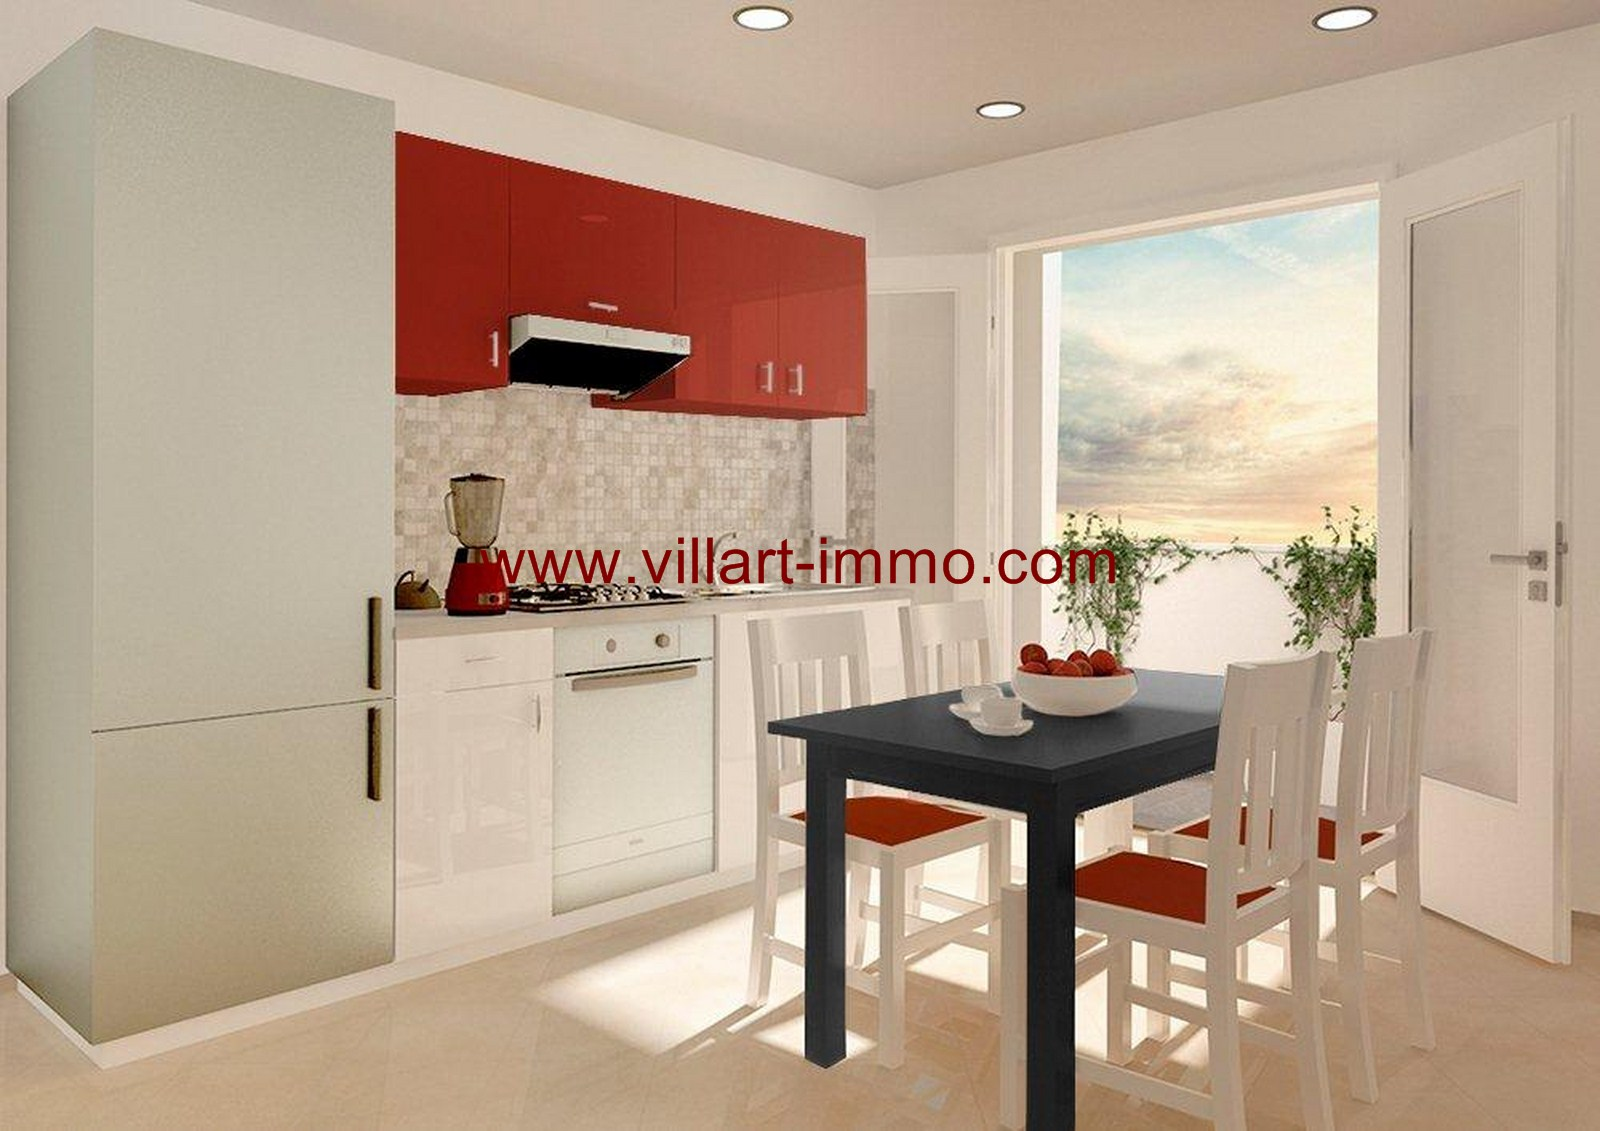 3-Vente-Appartement-Tanger-Centre-ville-SHAZ-Villart Immo